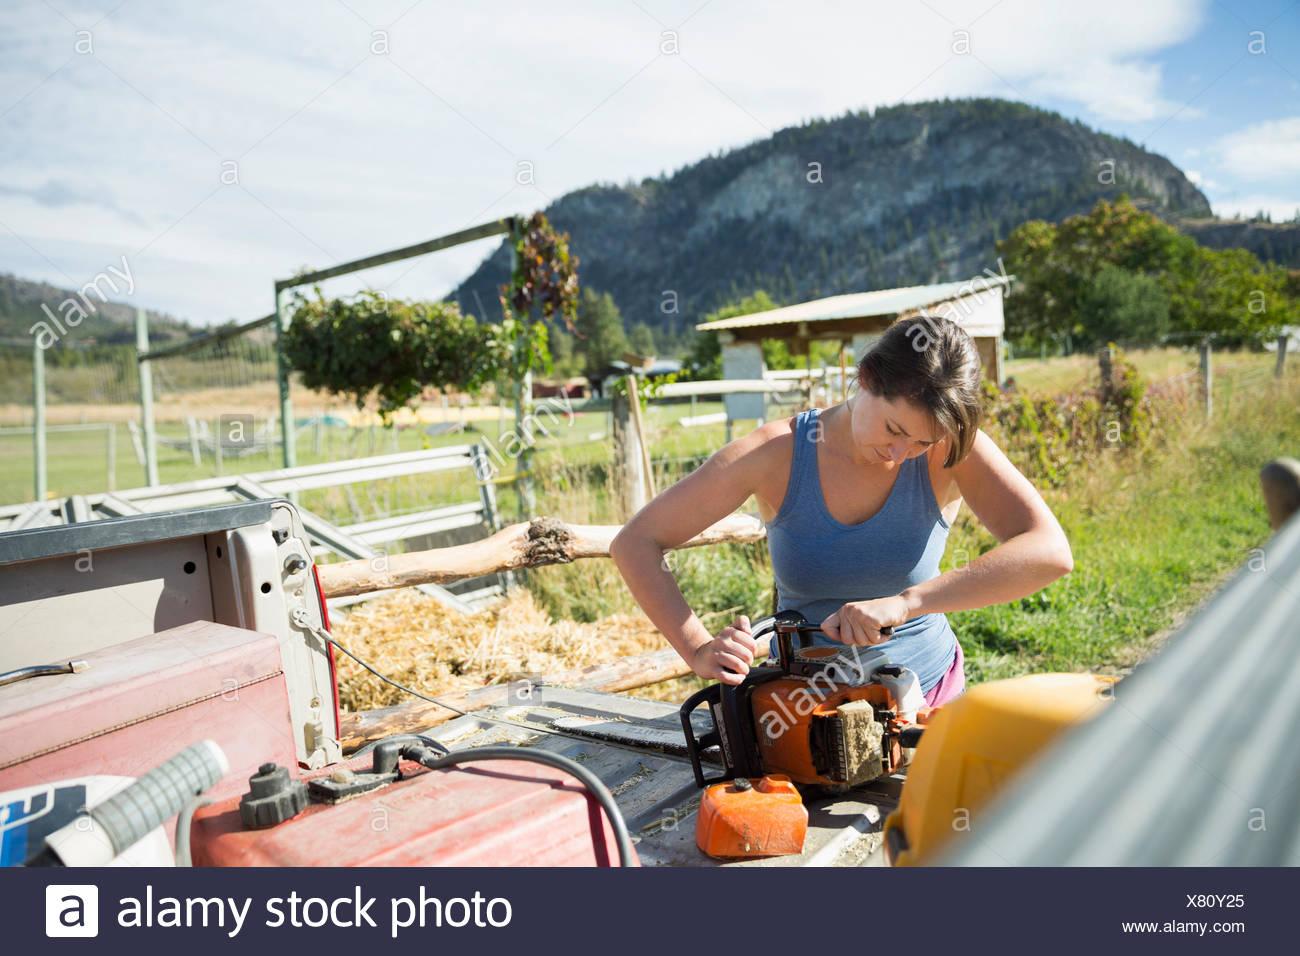 Female farmer fixing equipment on truck bed on sunny farm - Stock Image